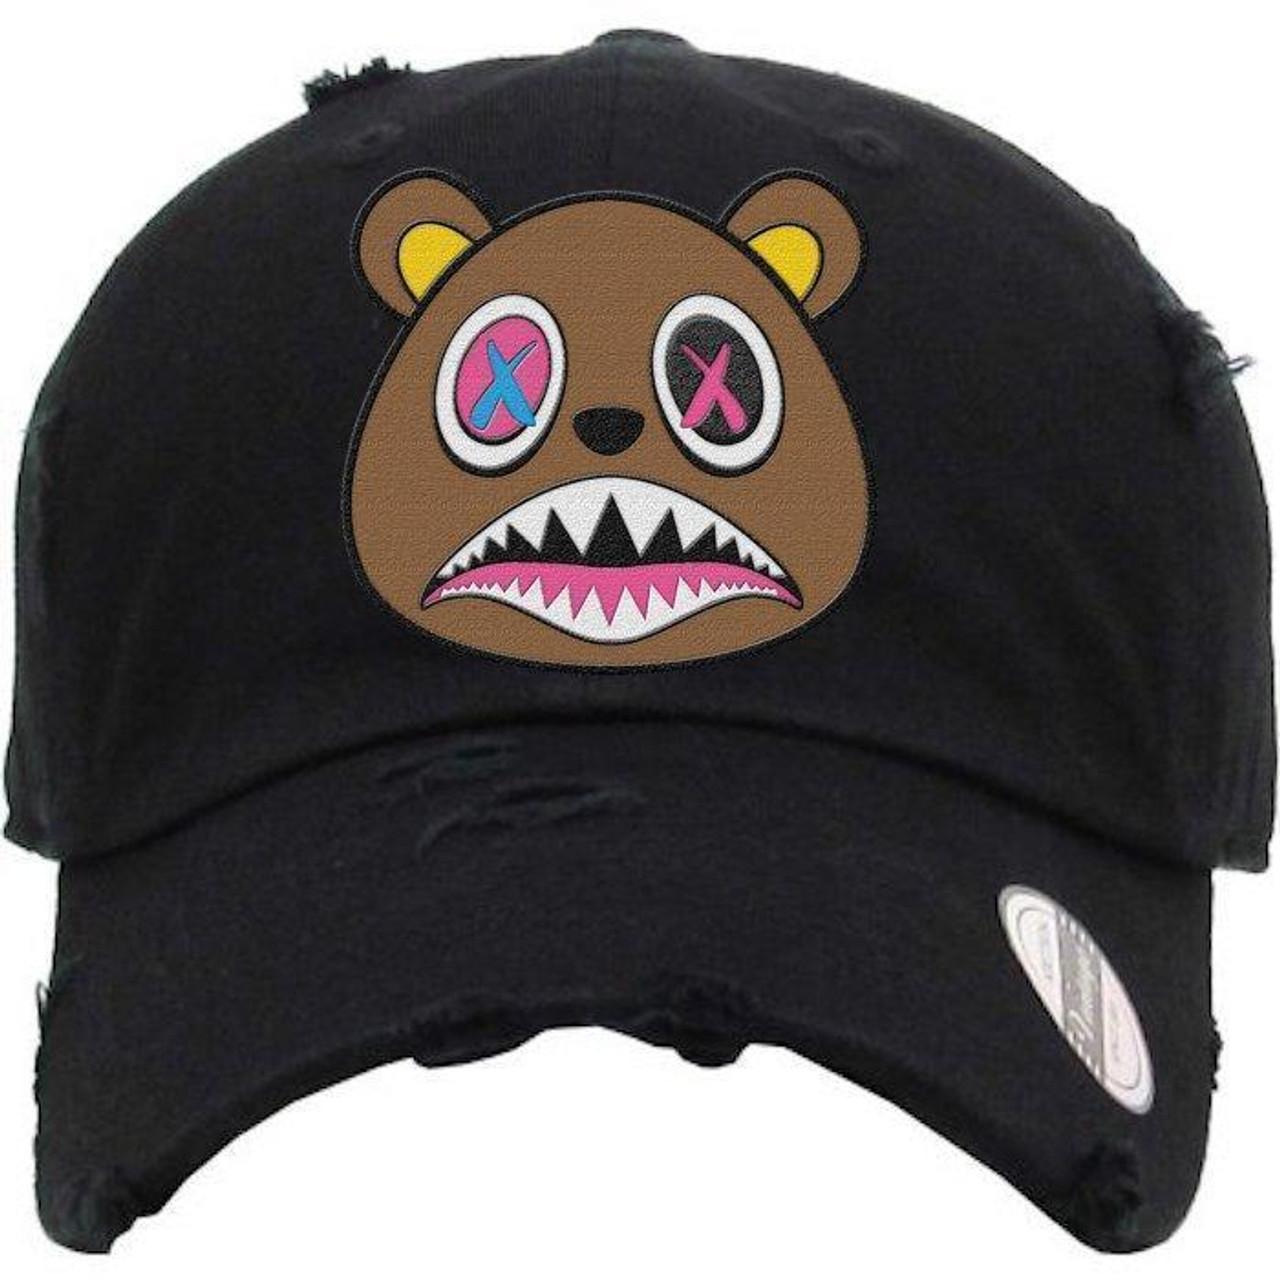 edf5b1d61ea BAWS Brown Bear Black Dad Hat - KCT Streetwear - OFFICAL NZ ...